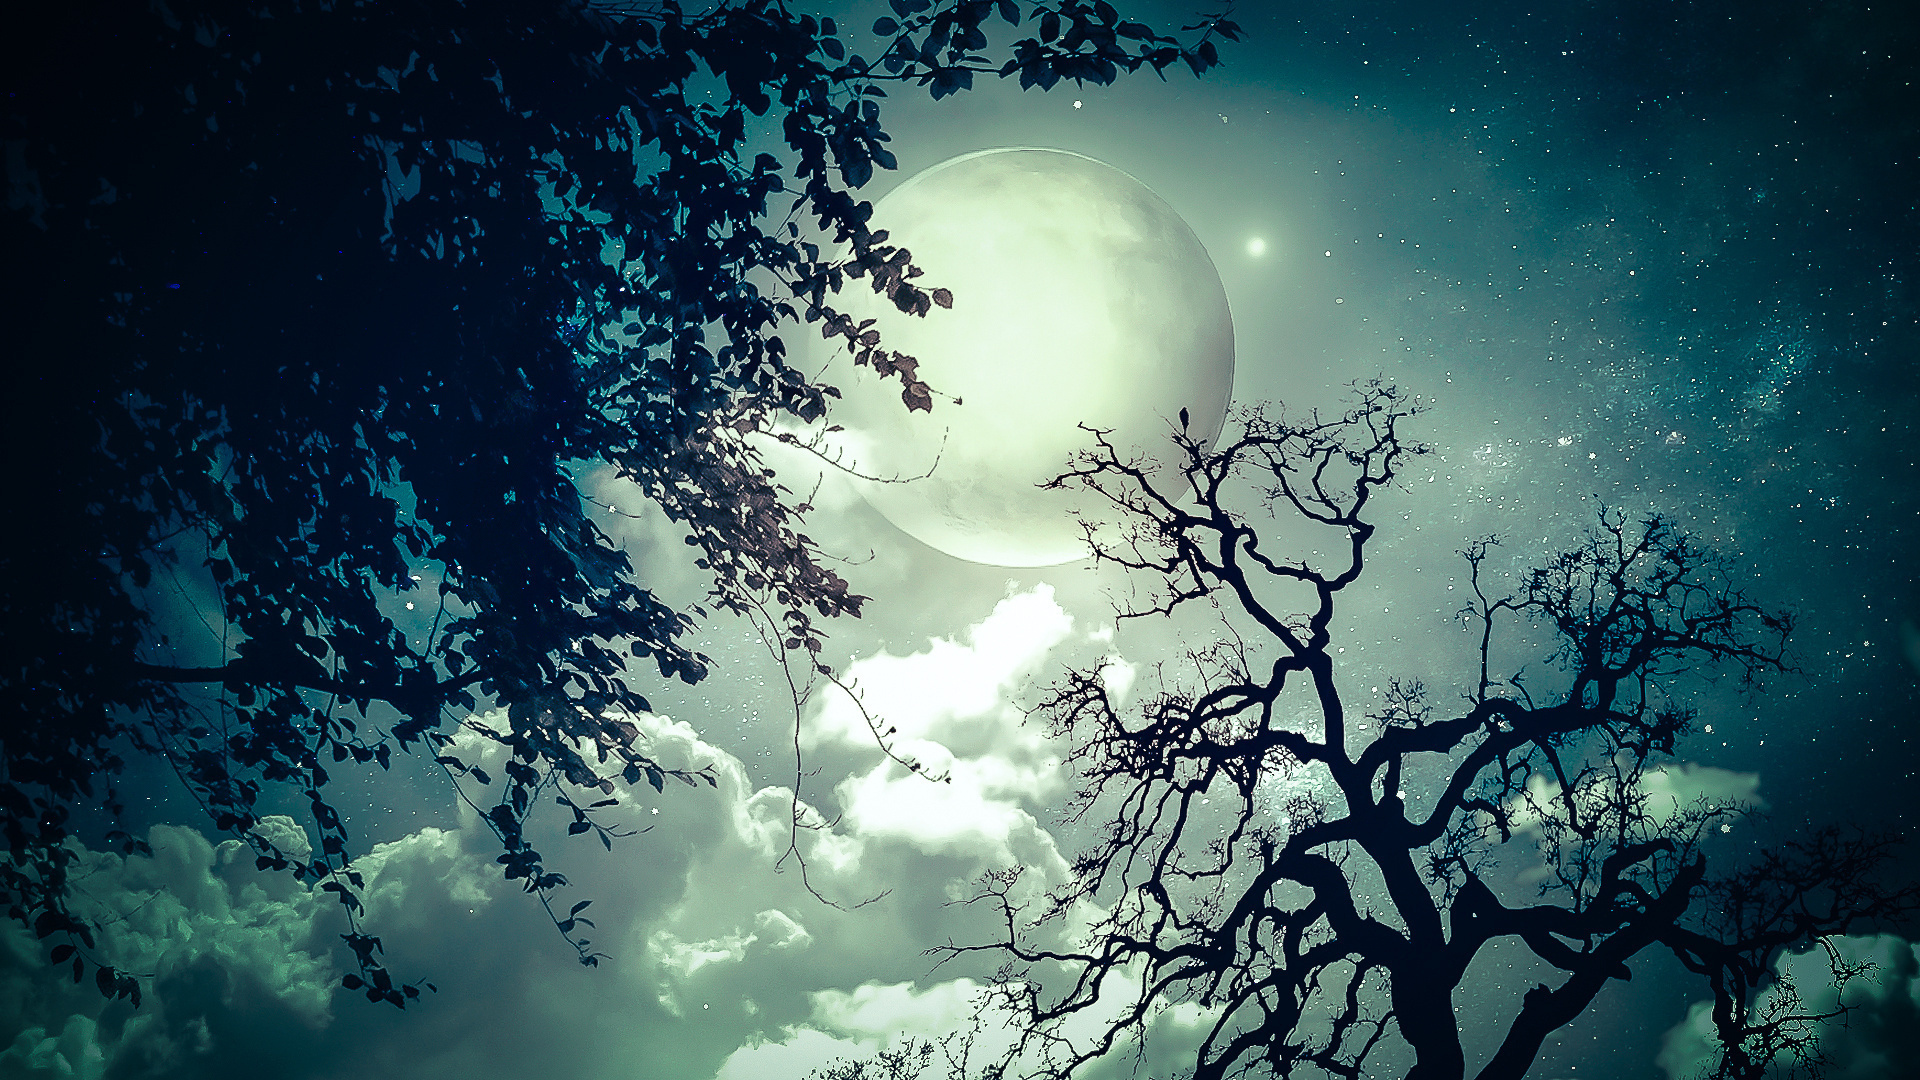 Dream Cloud Wallpaper Moon Trees Clouds Dream Stars